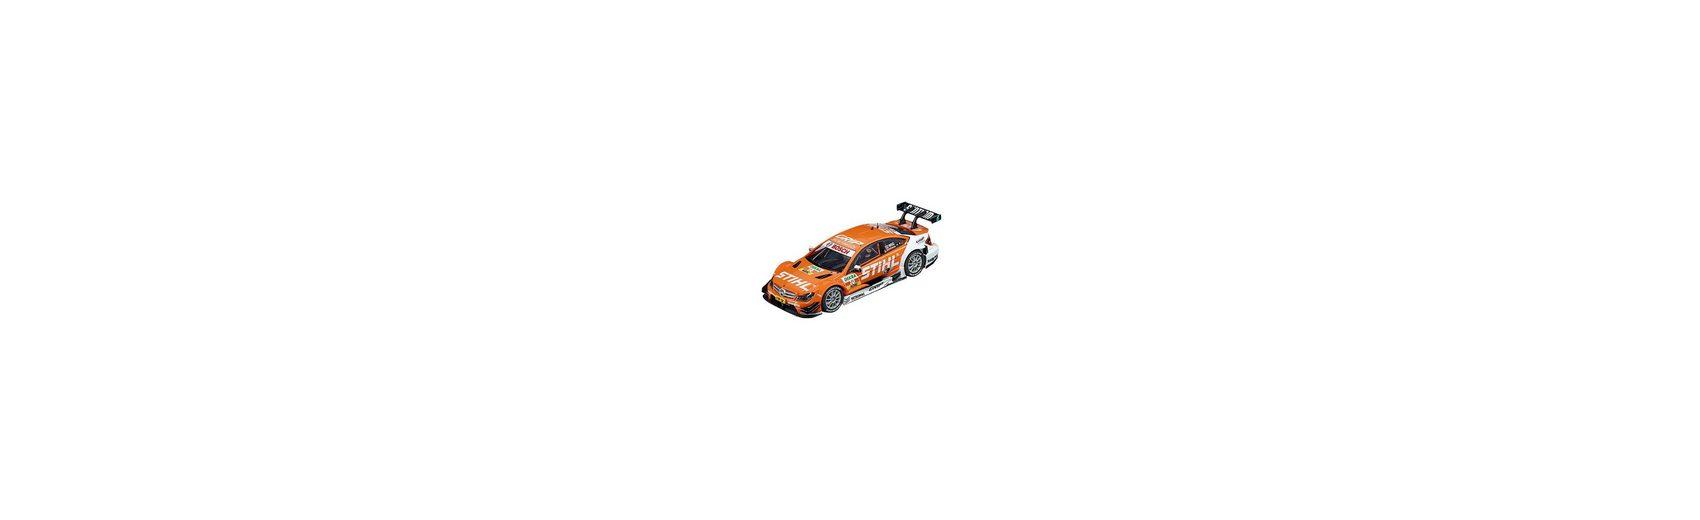 "Carrera Evolution 27476 AMG Mercedes C-Coupe DTM ""W.Wickens, No.10"","